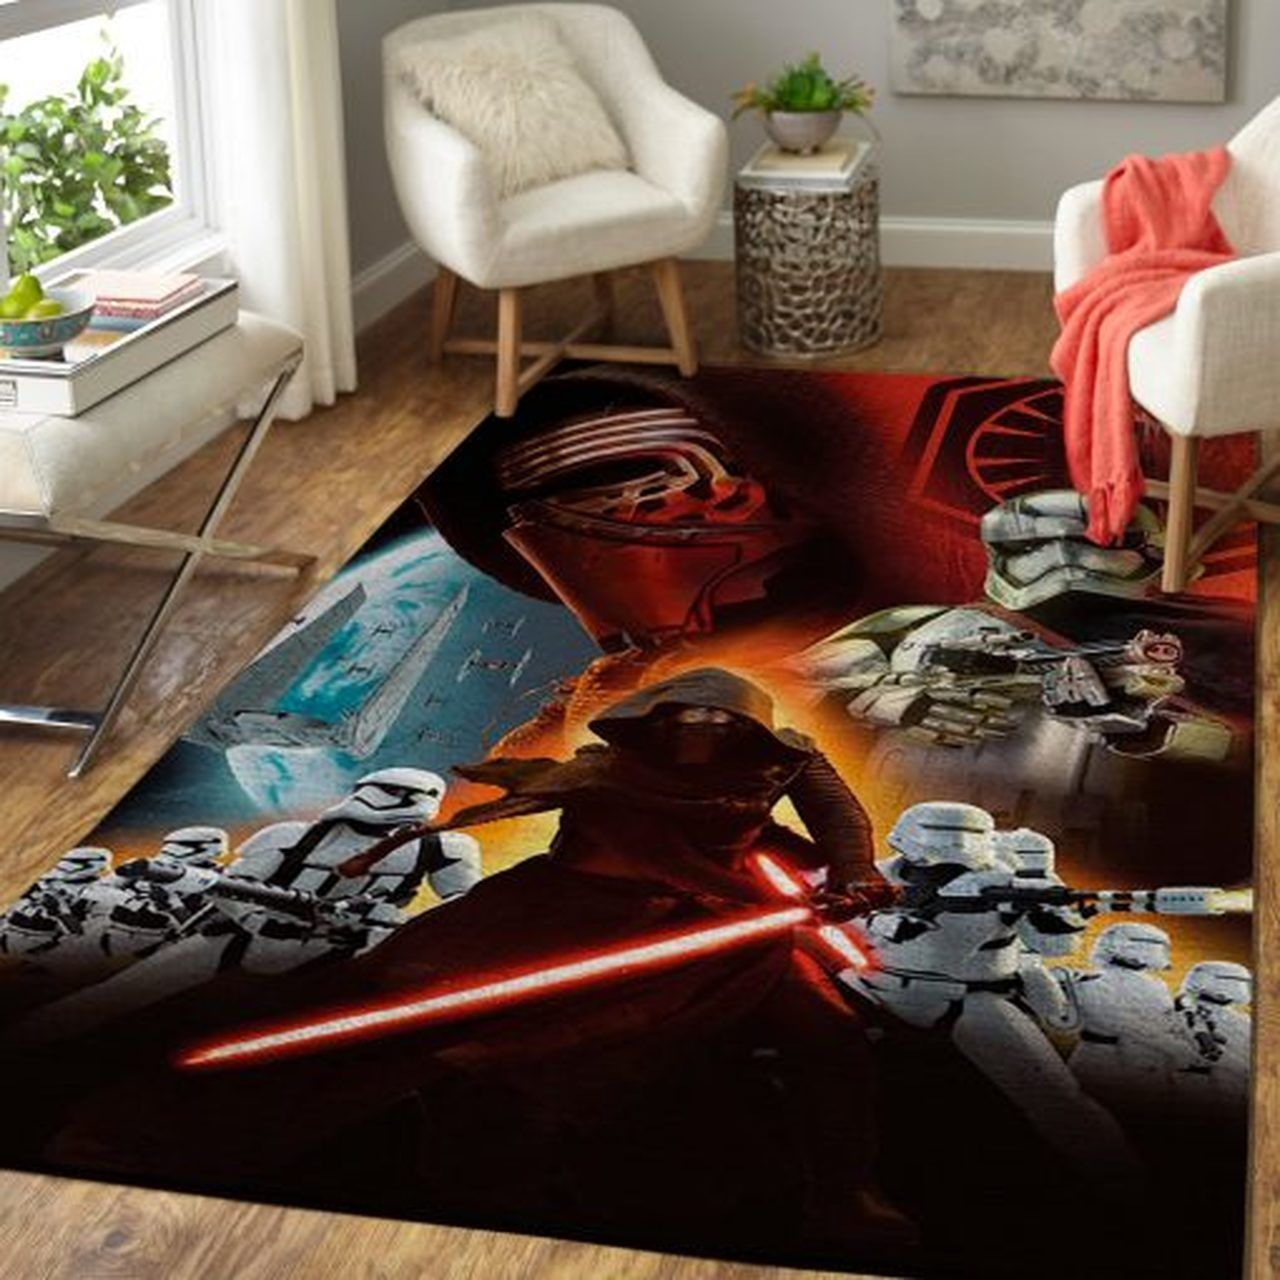 The Force Awakens Star Wars Rug